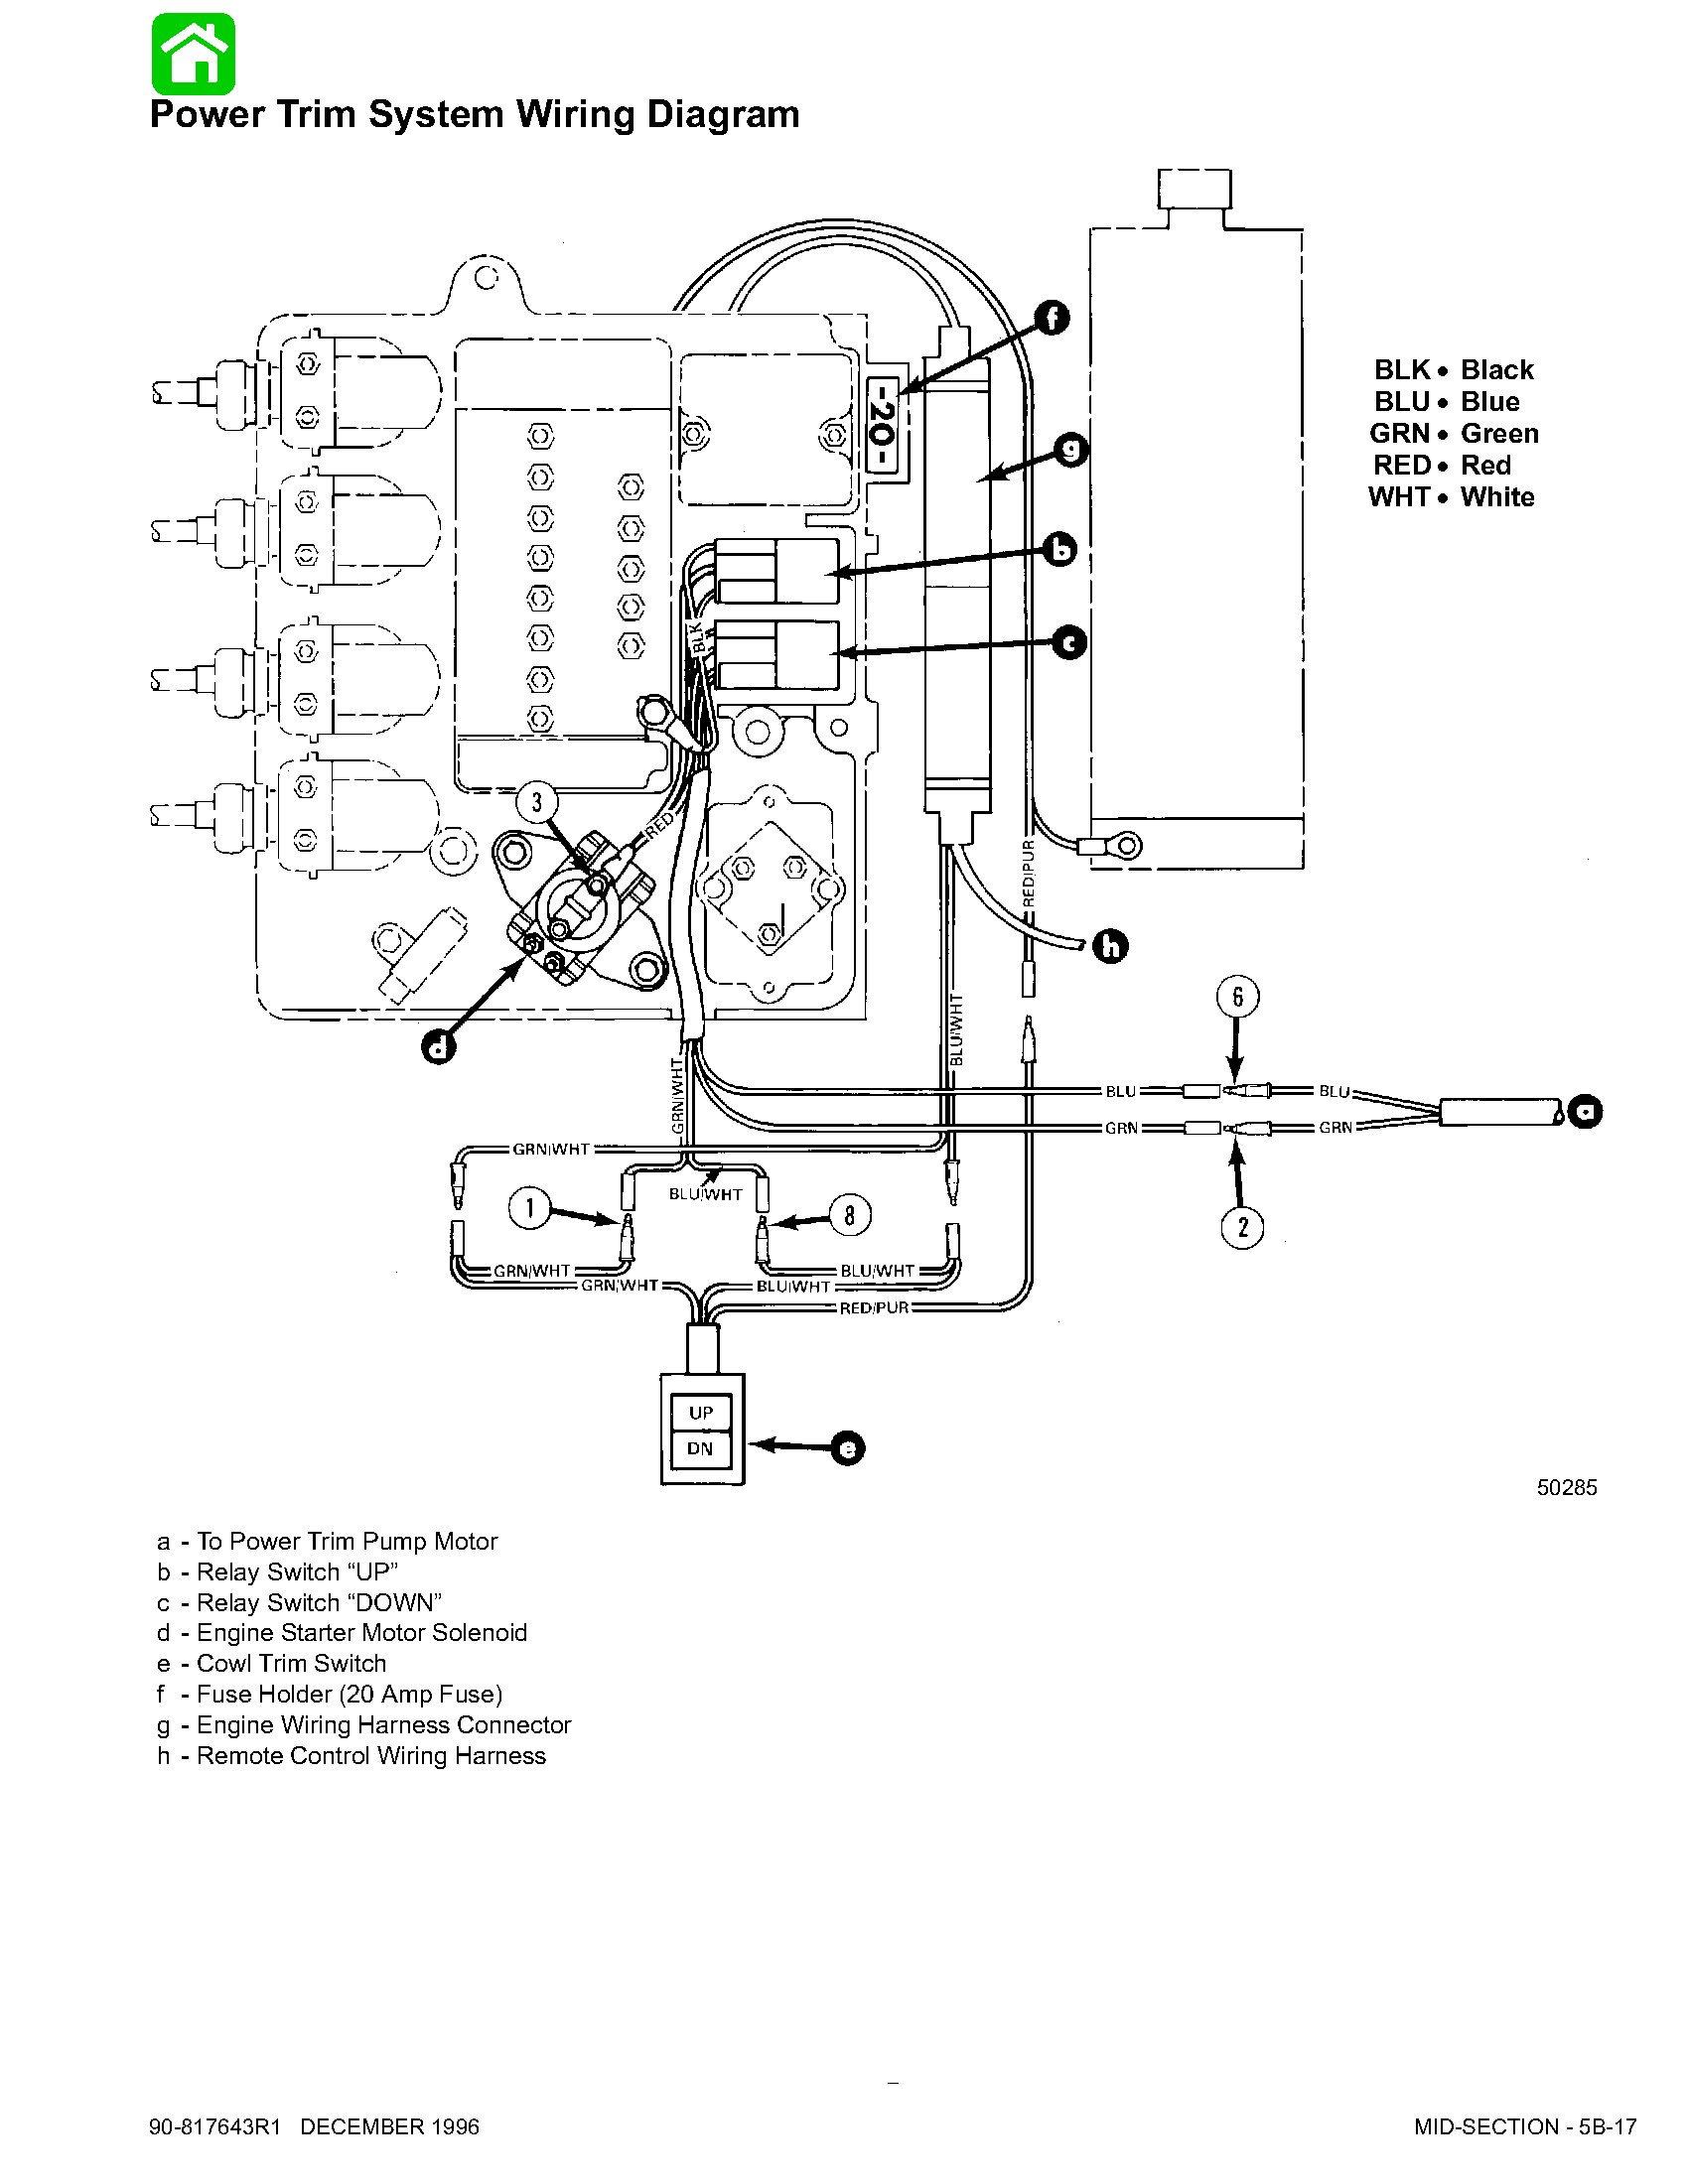 cc_4939] mercury 60 elpto wiring diagram download diagram tohatsu wiring diagram free download schematic mercury 9.9 wiring diagram bachi salv mohammedshrine librar wiring 101